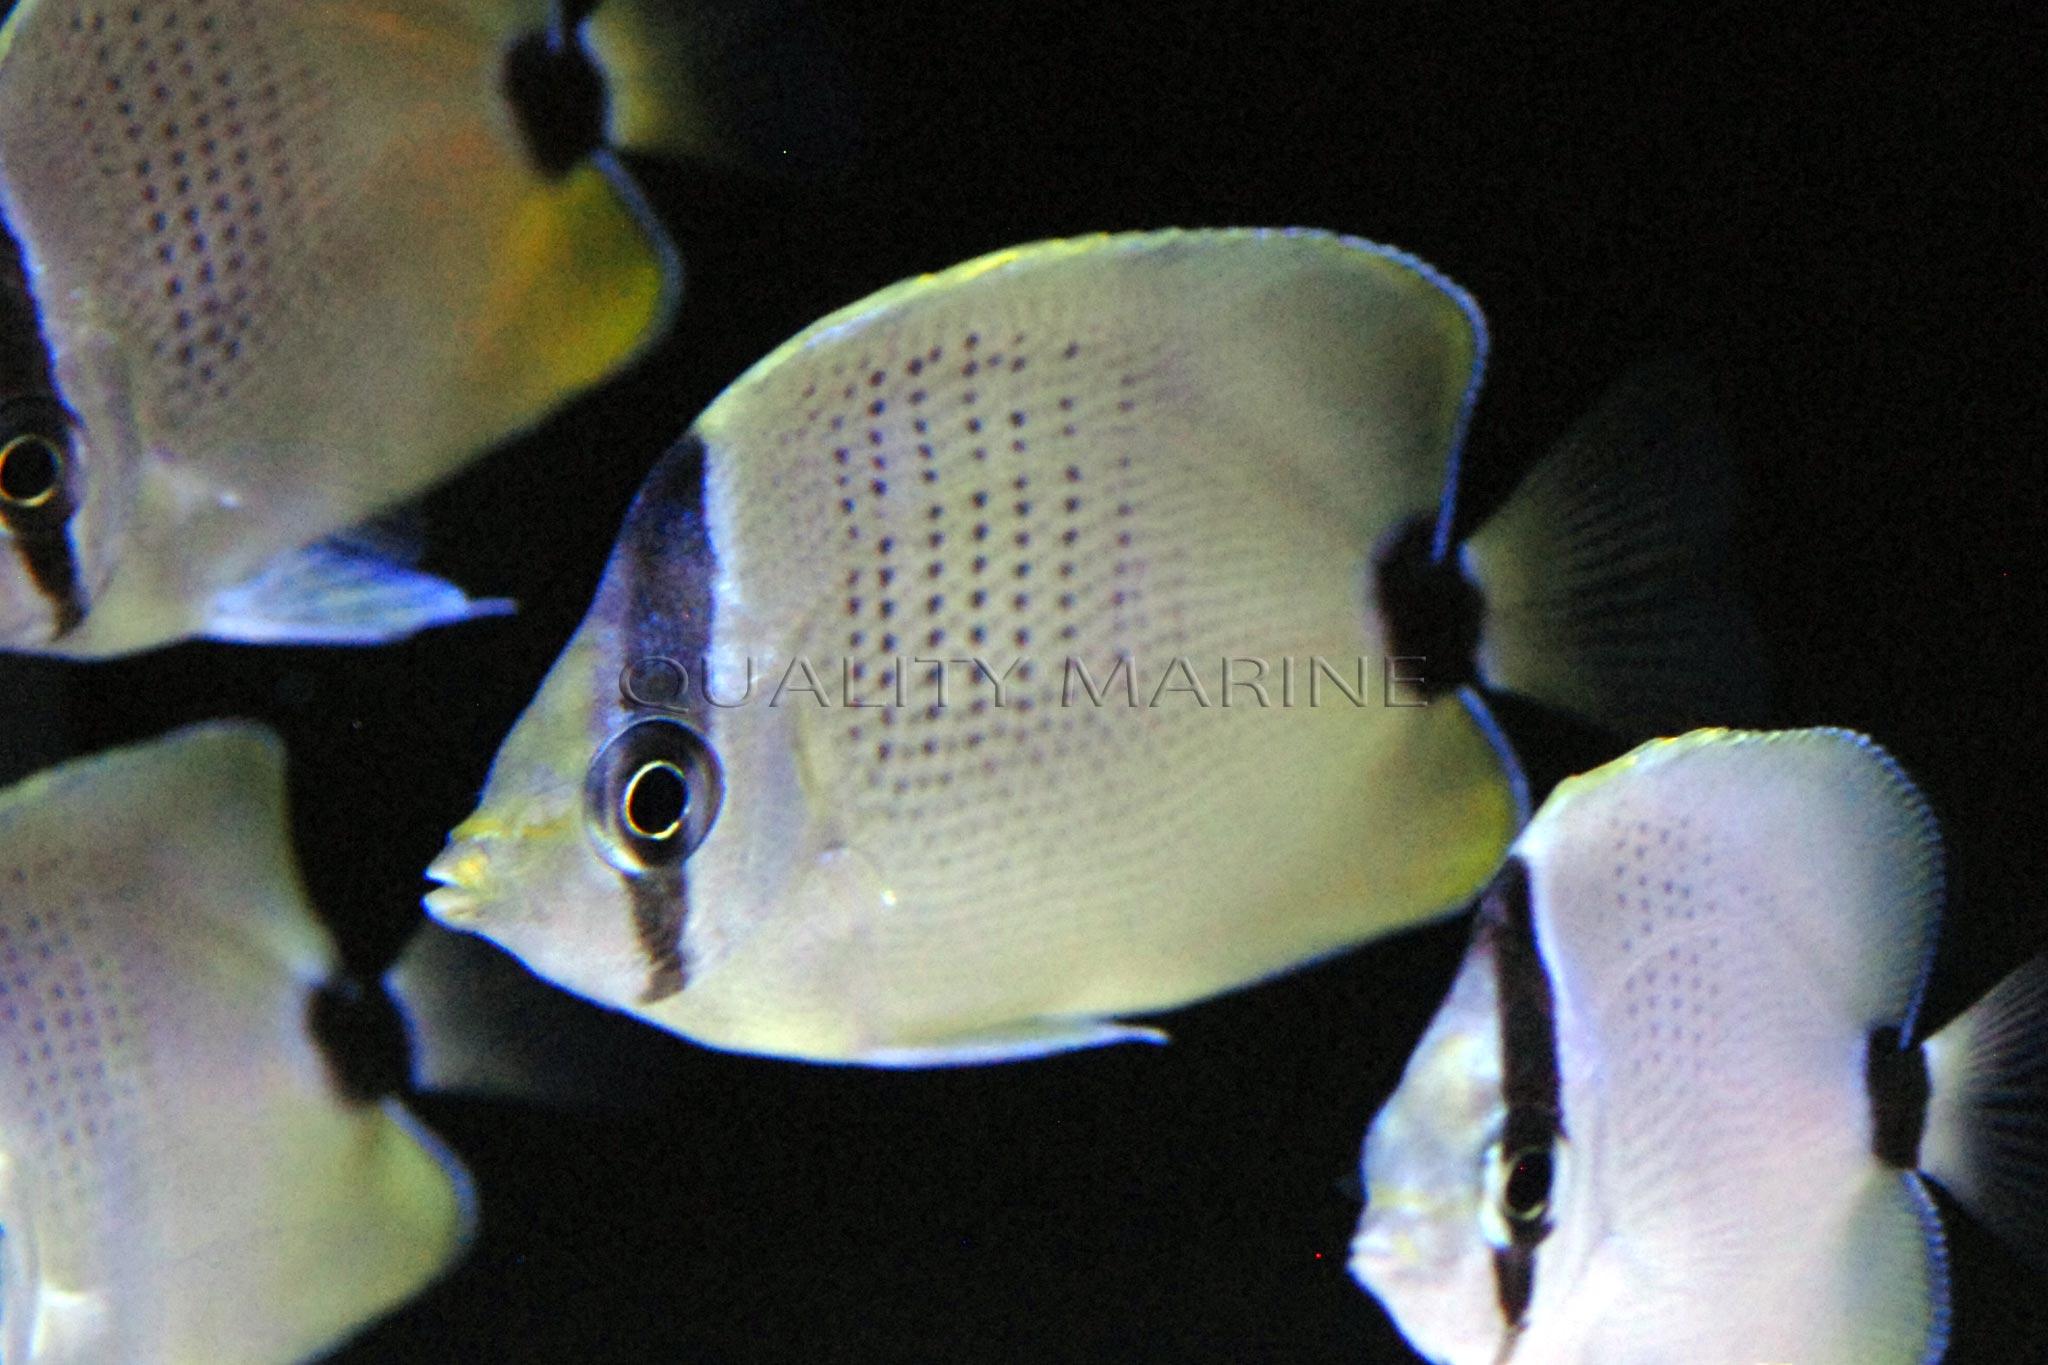 Image AC-Lemon-miliaris-butterflyfish-6.jpg